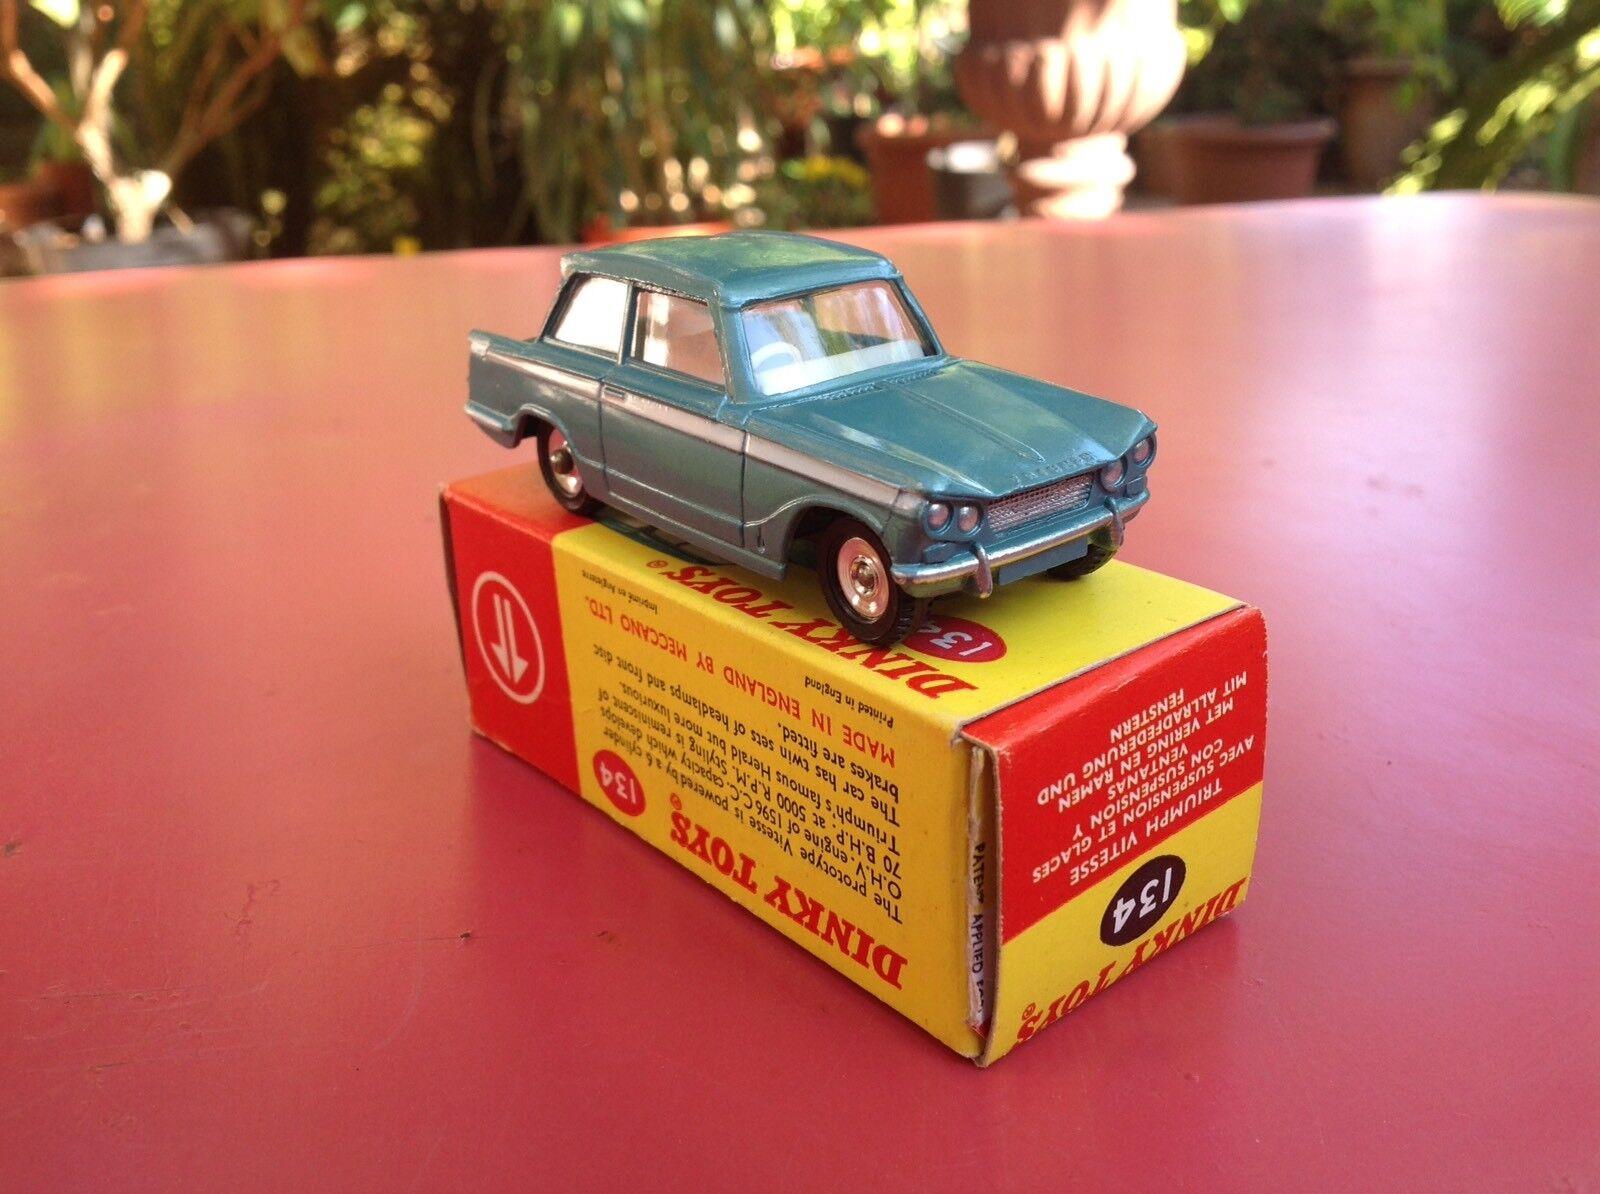 para proporcionarle una compra en línea agradable Dinky Dinky Dinky Juguetes Réf 134 Triumph Vitesse Rare intérieur gris très pal very mint in box  Precio por piso